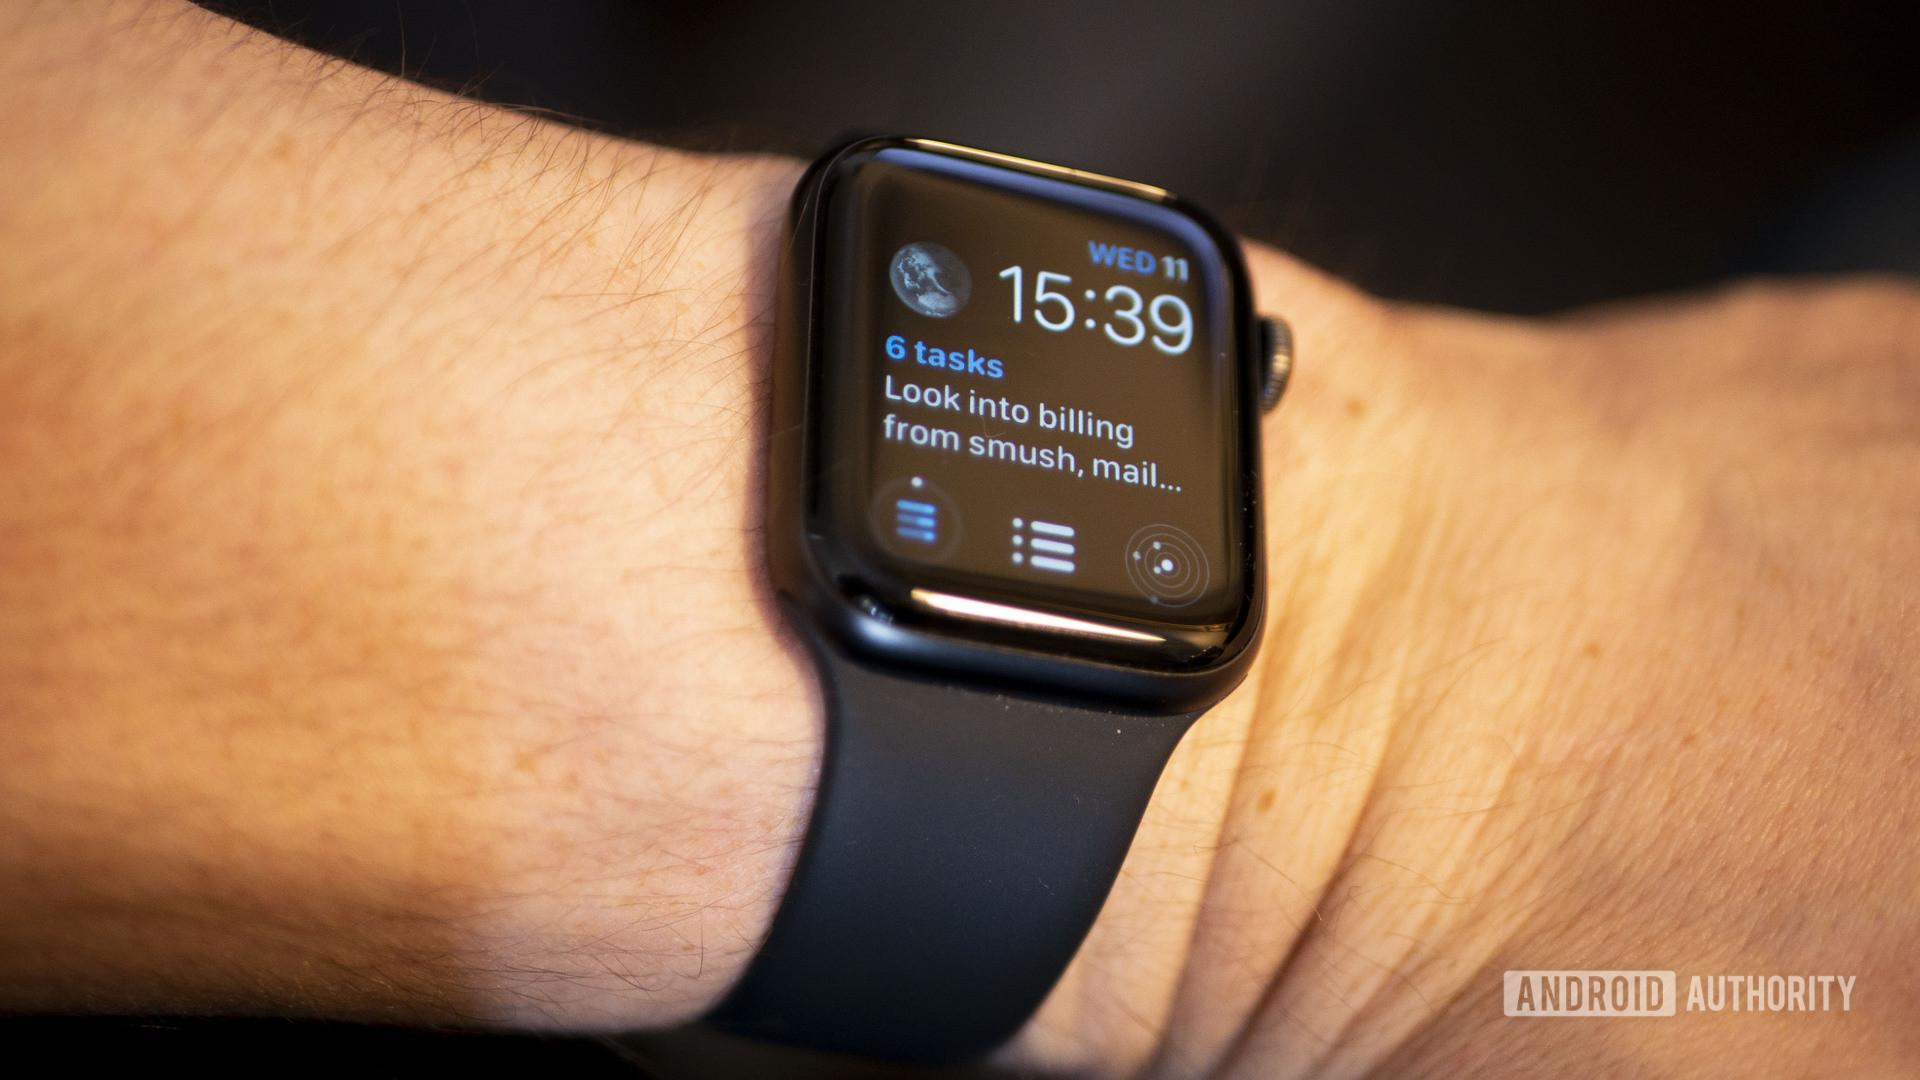 Apple Watch Complications 2